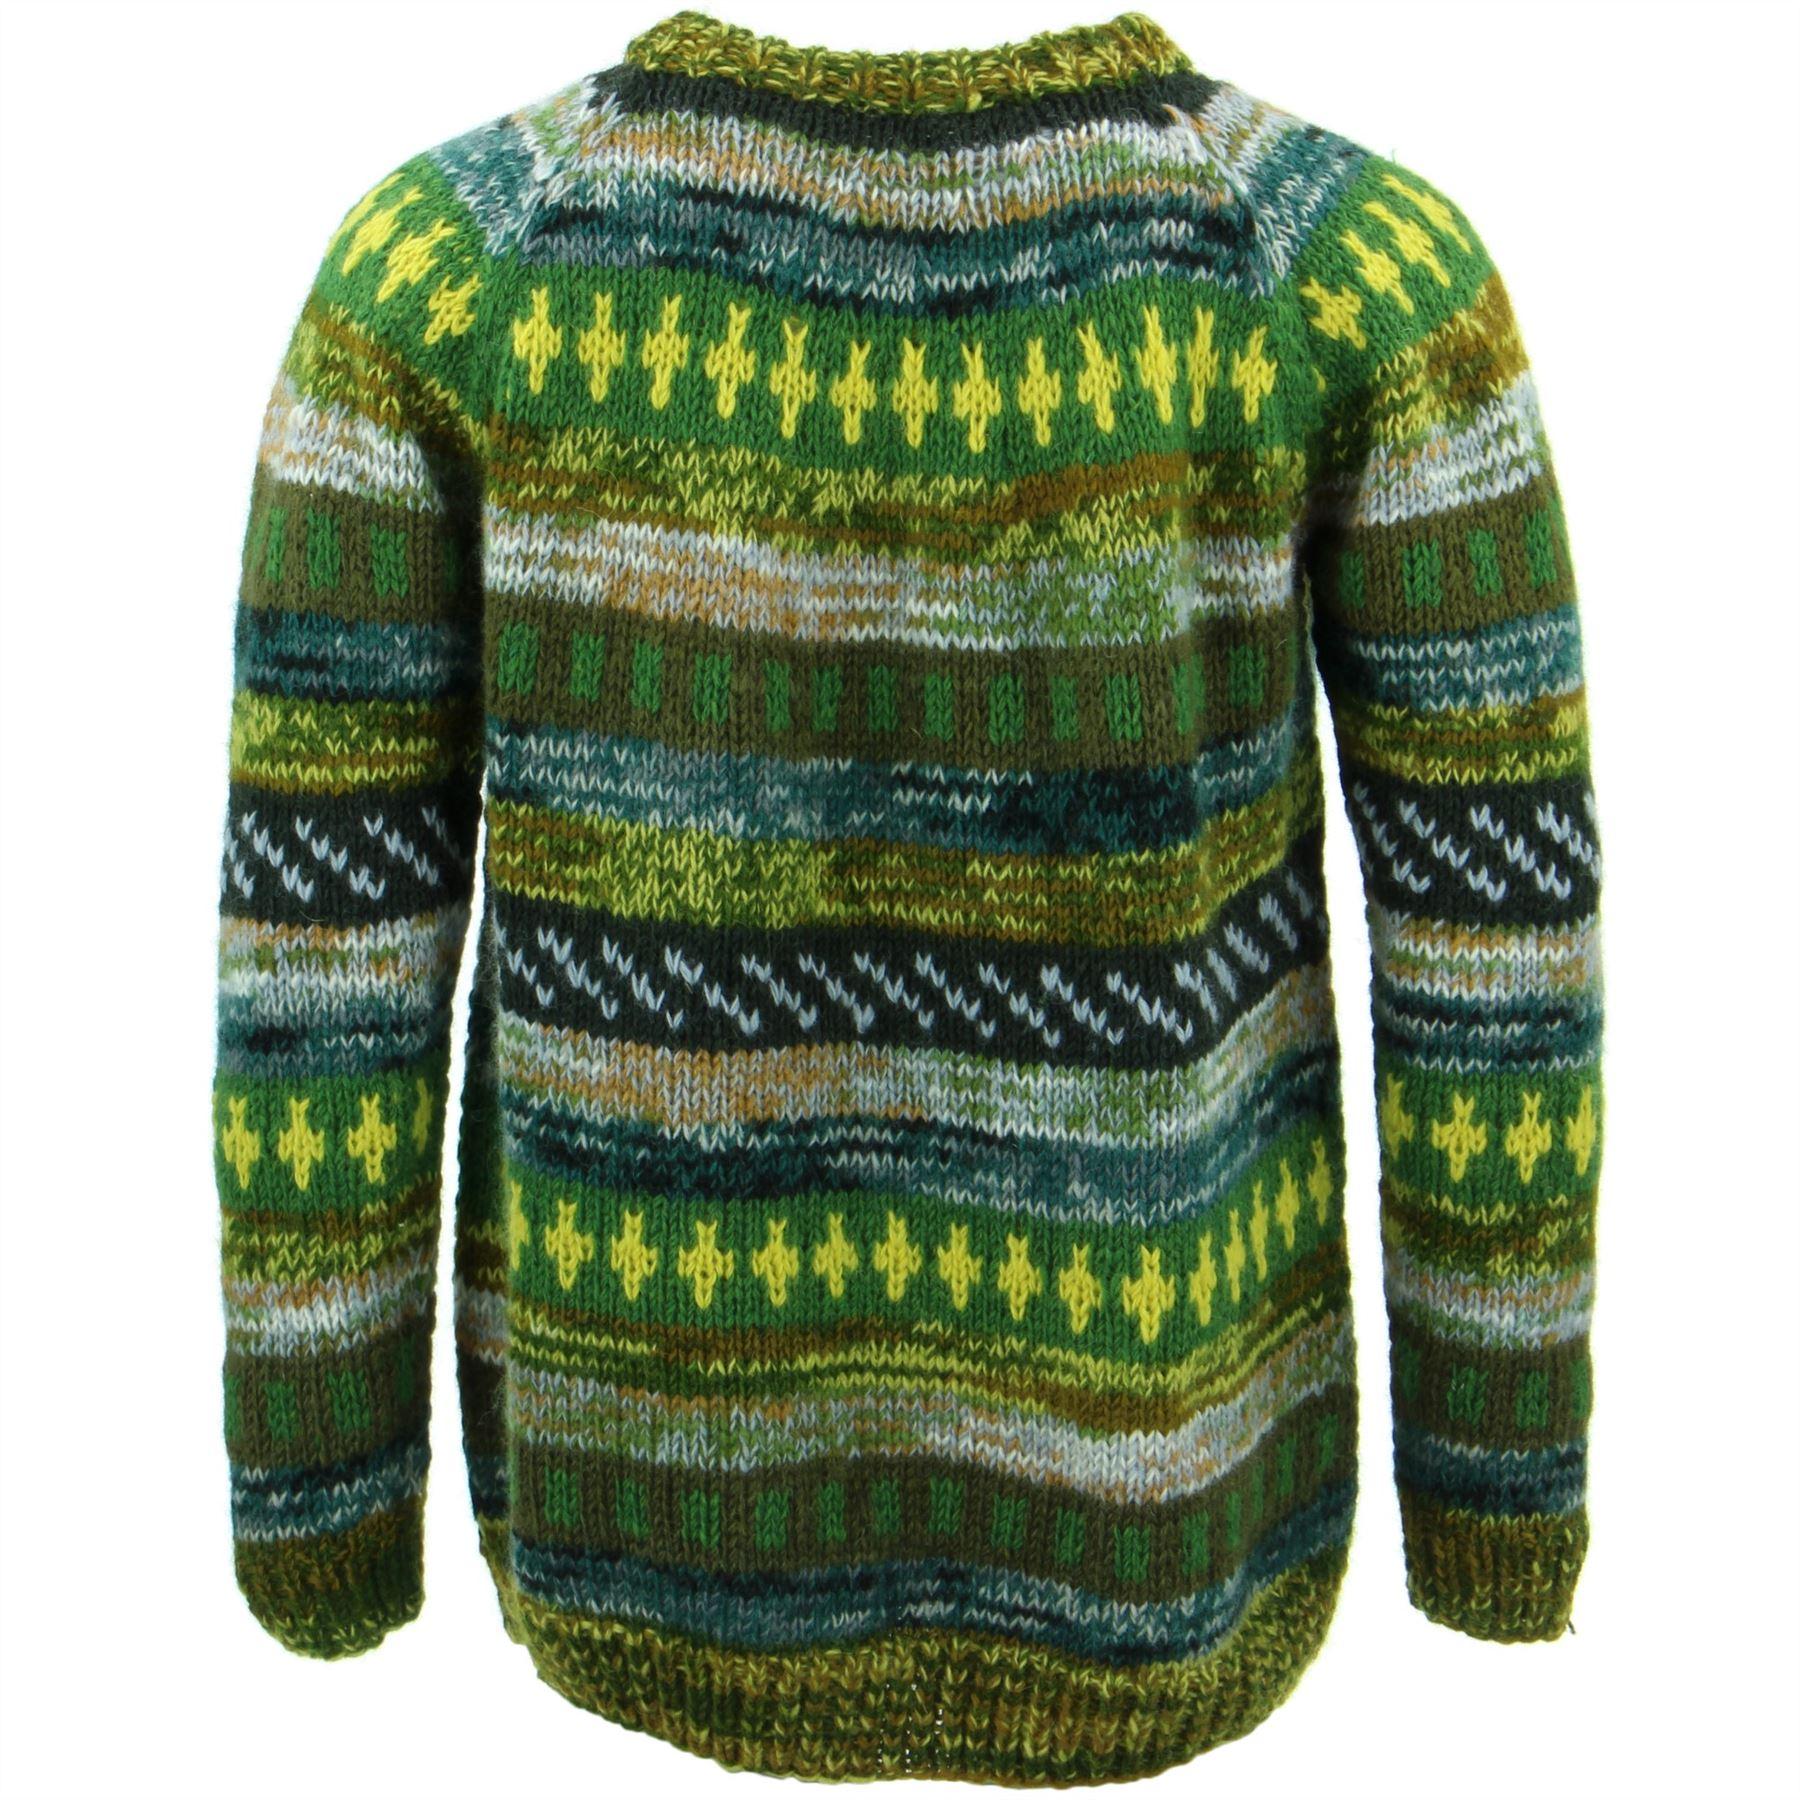 thumbnail 10 - Wool Knit Jumper Sweater Pullover Fairisle Nordic Abstract Warm Nepal Loose